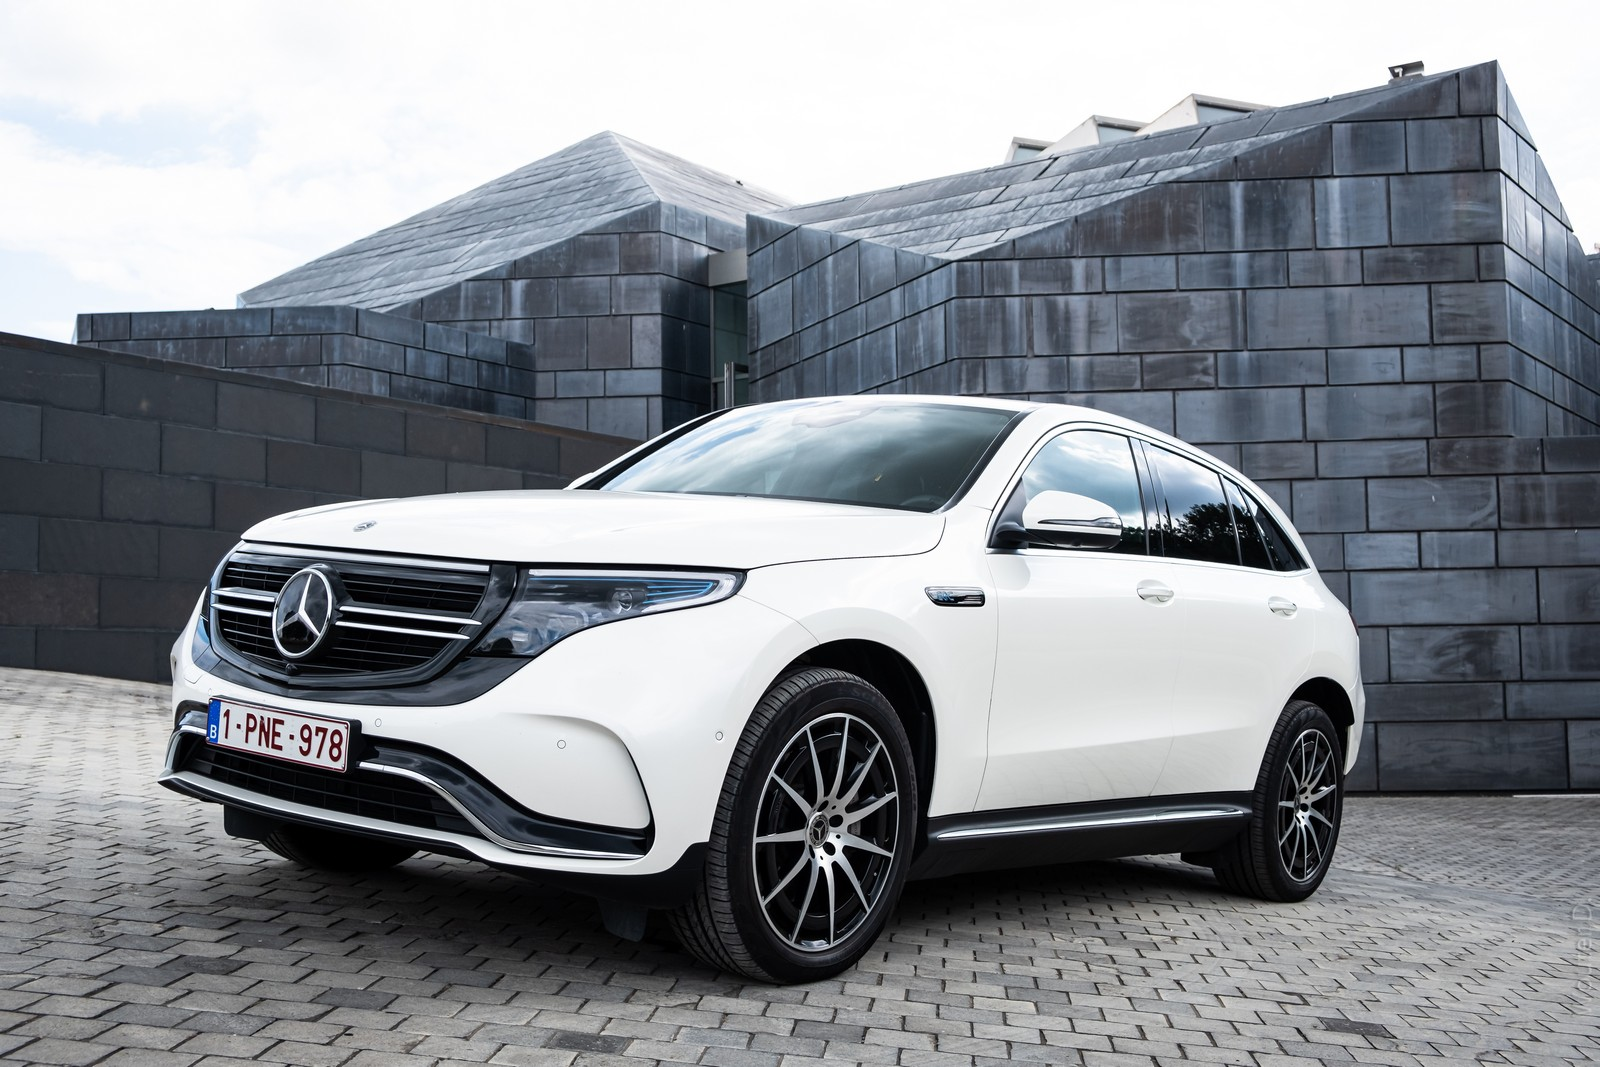 2020 Mercedes-Benz EQC 400 : Why Choose an Electric Mercedes?